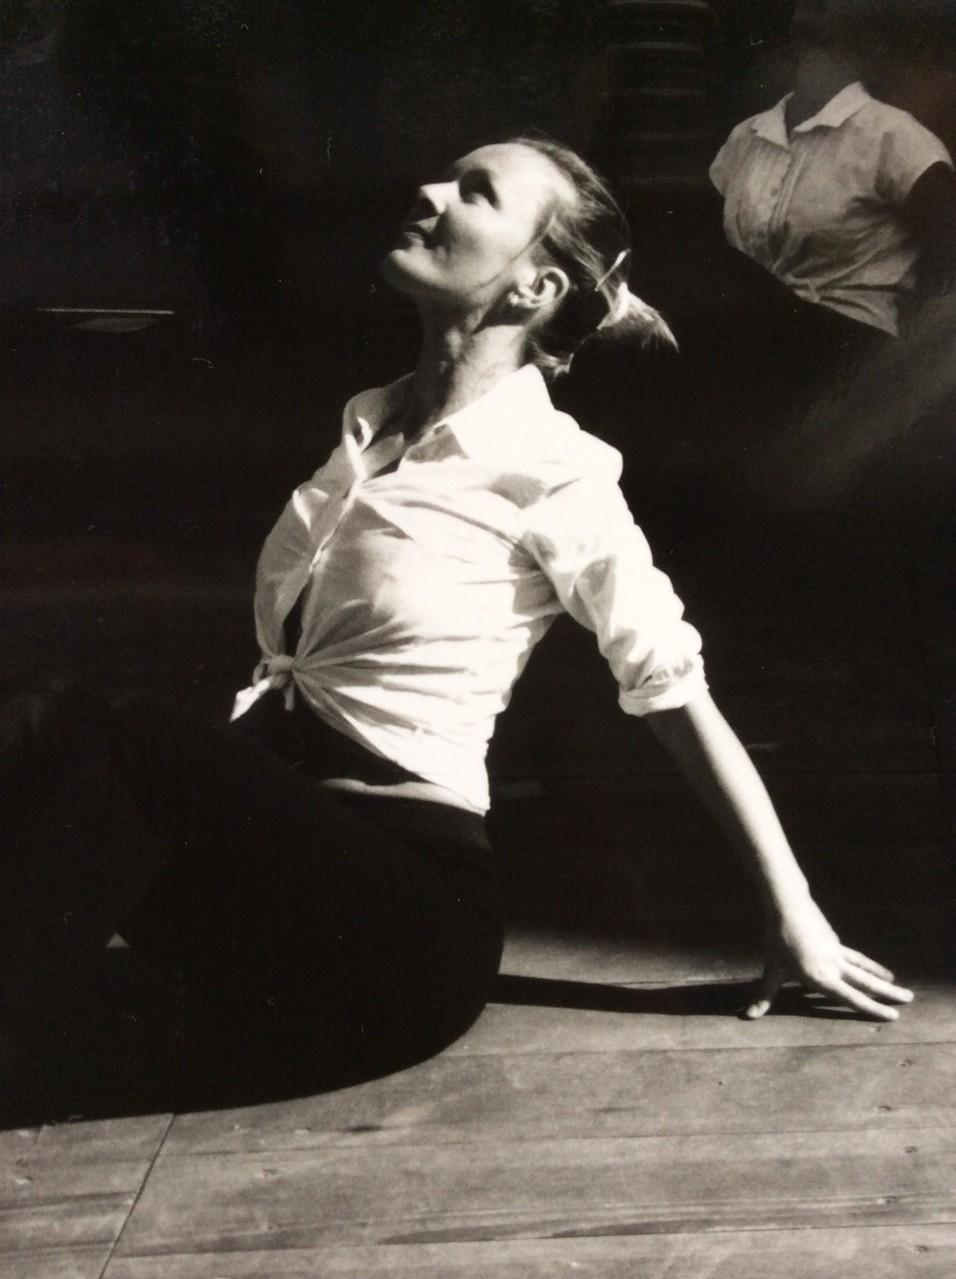 Jazzdance Company, Emmendingen 1997